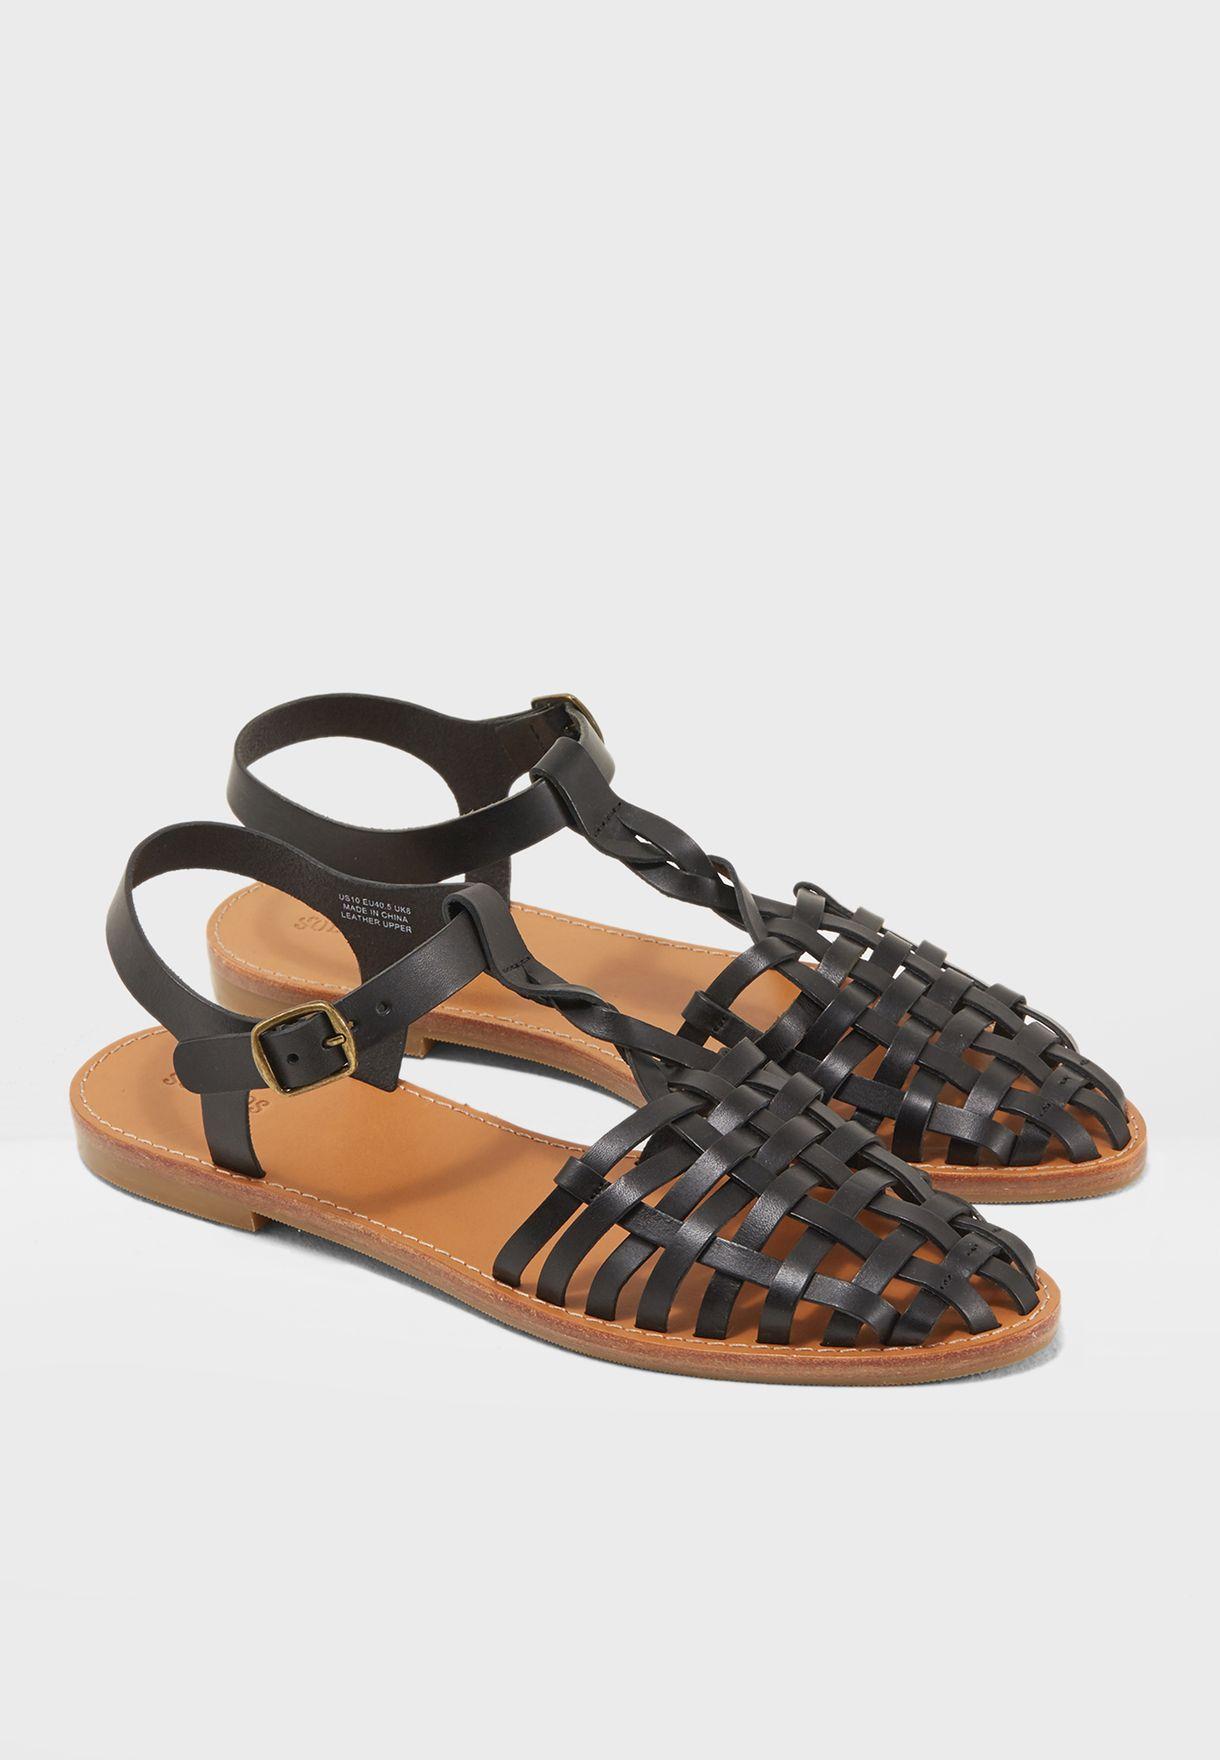 244635fe2 Shop Soludos black Woven Fisherman Sandal 1000302 for Women in Saudi ...